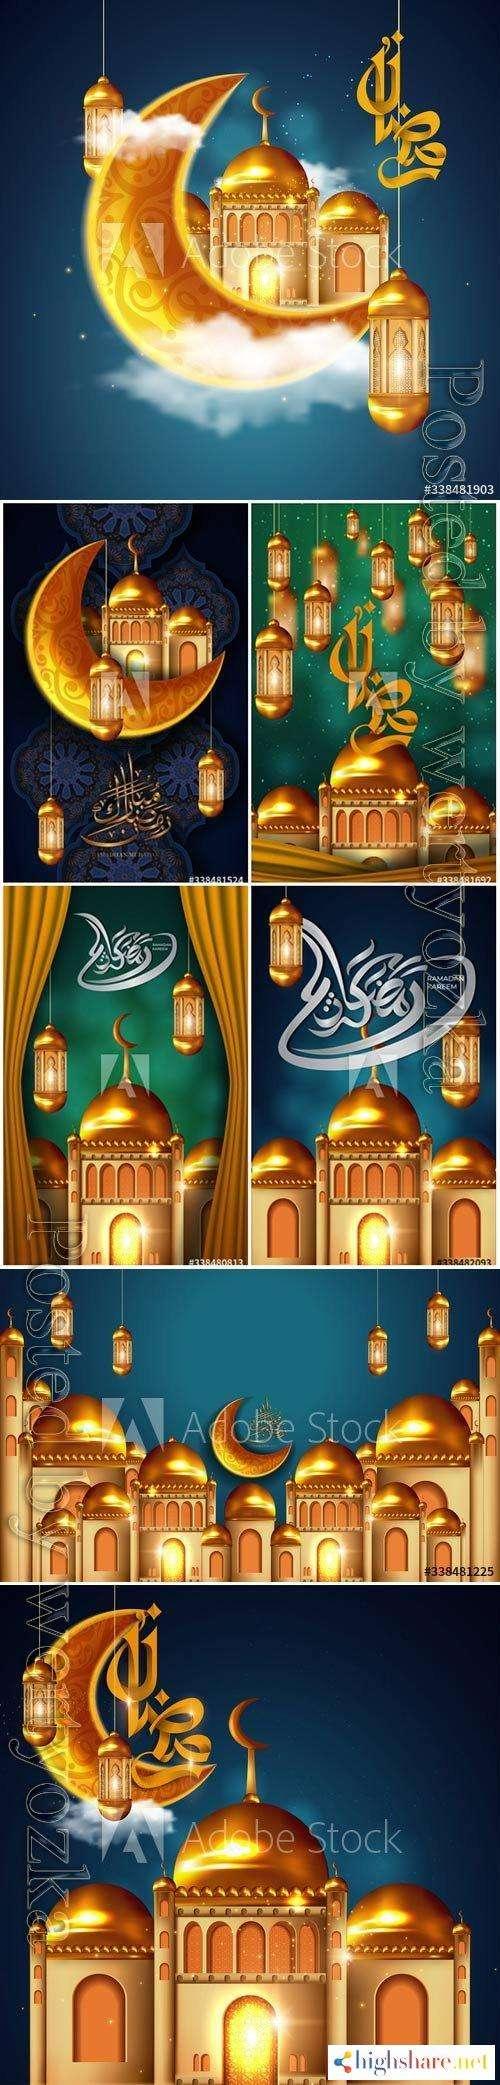 ramadan kareem beautiful greeting card with arabic calligraphy 5f4383eb5fe85 - Ramadan Kareem beautiful greeting card with arabic calligraphy